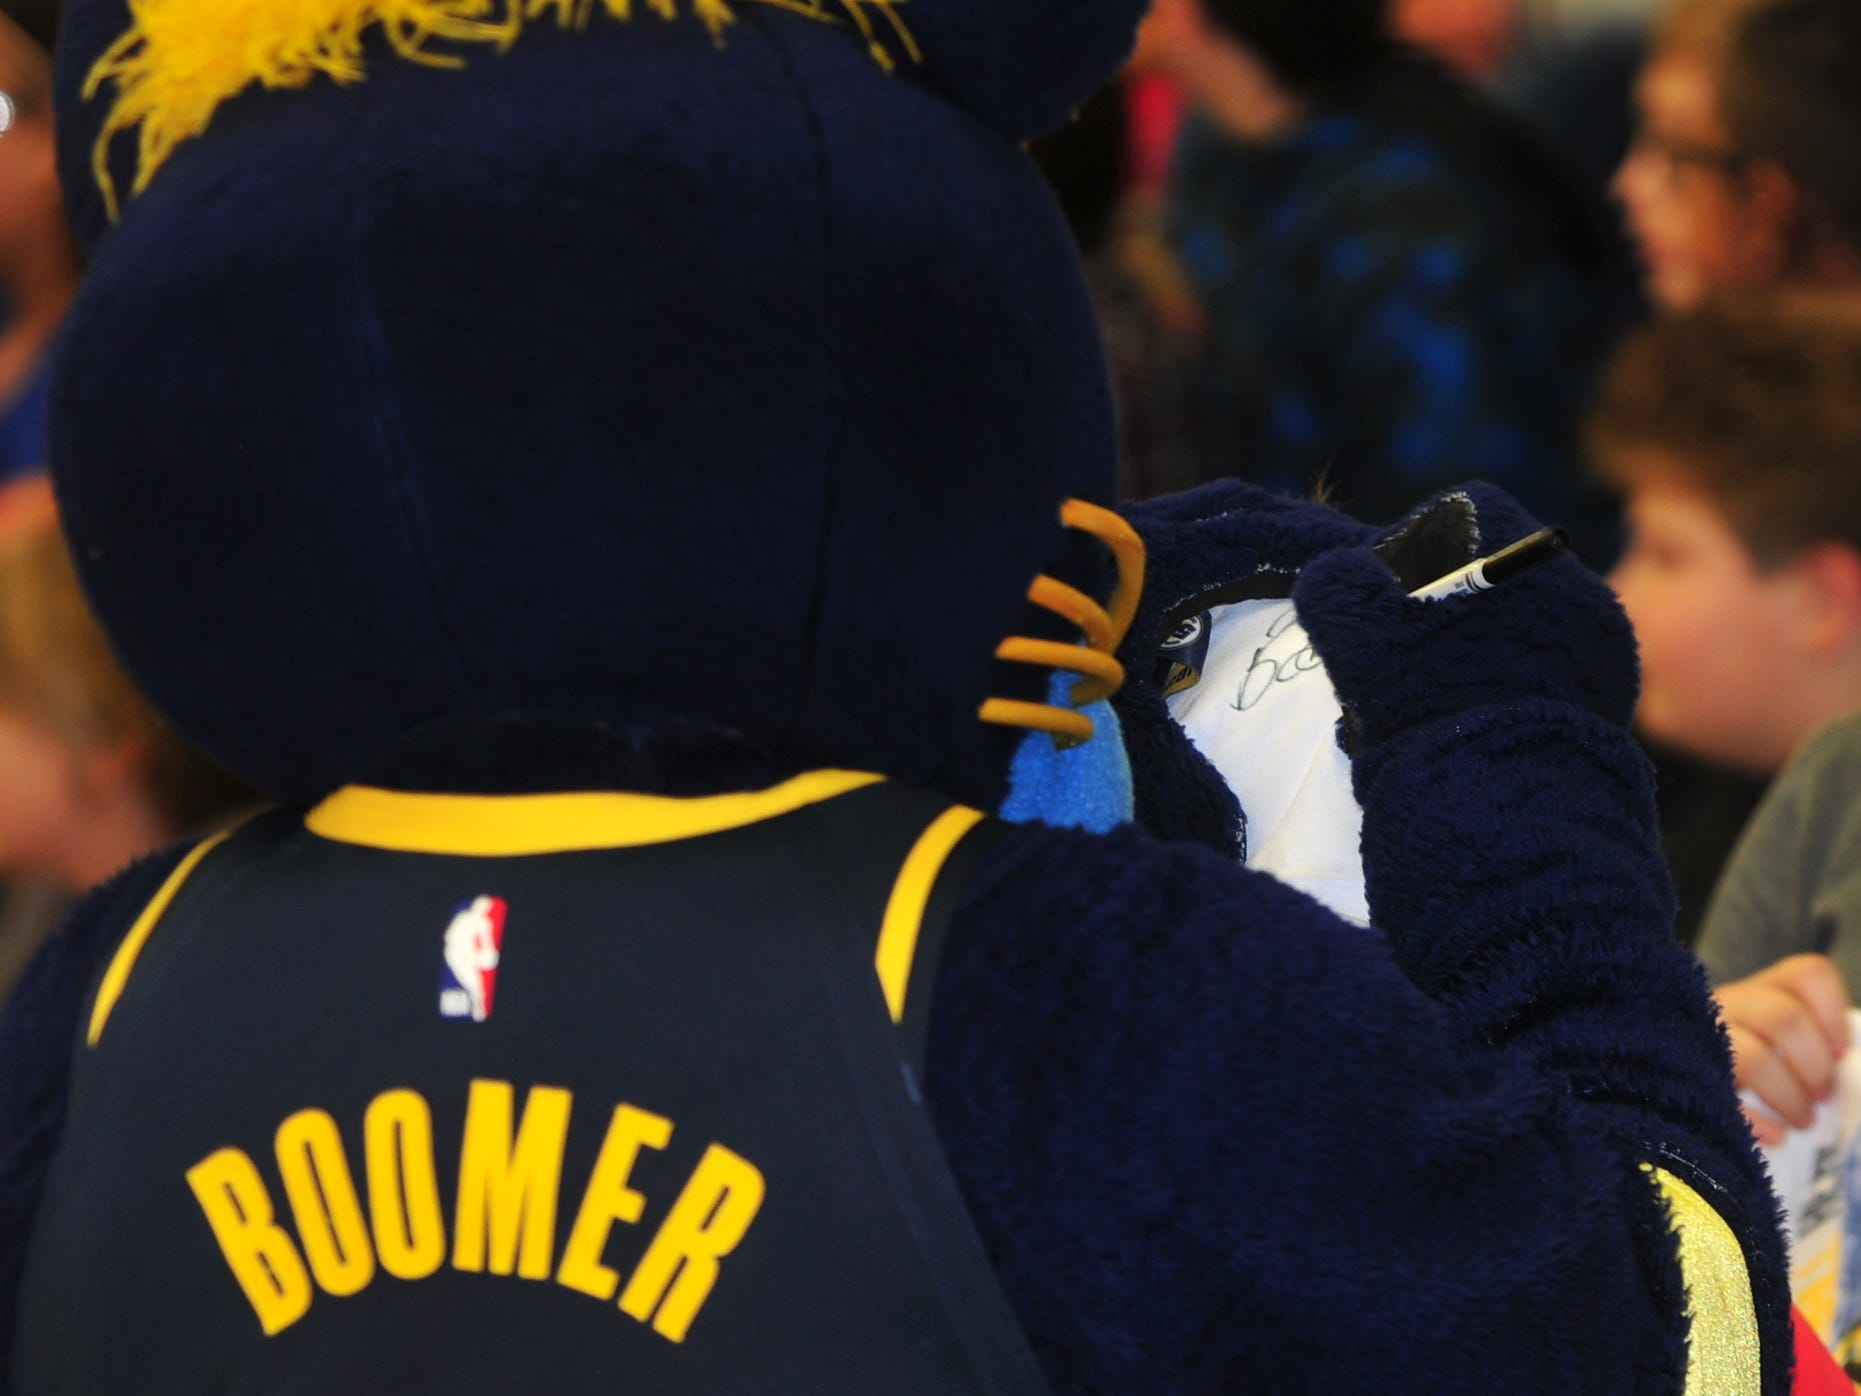 Boomer autographs a T-shirt during Wednesday's program in Dennis Intermediate School.